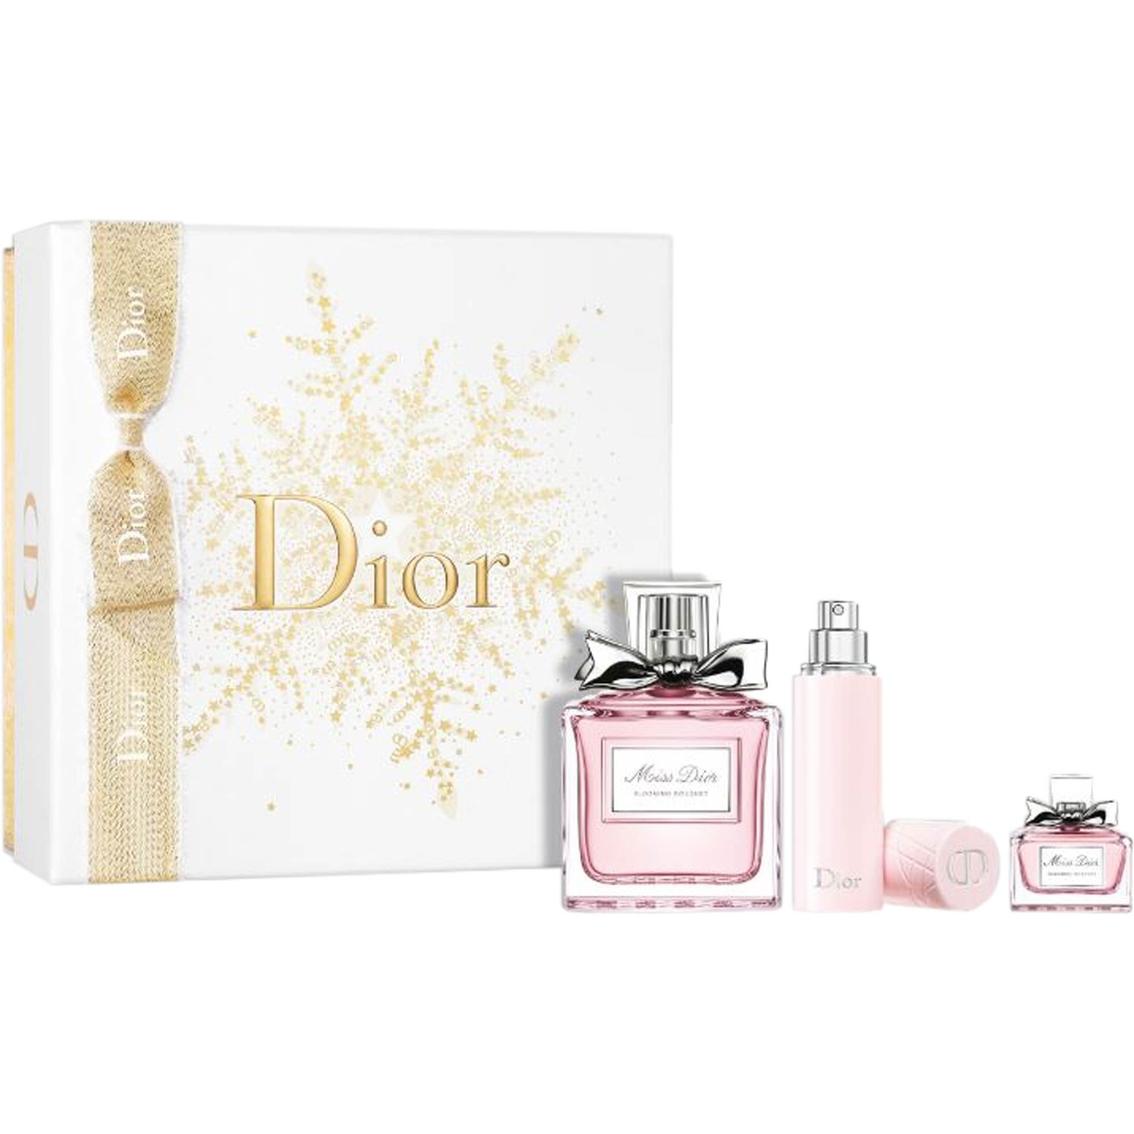 Dior miss dior blooming bouquet gift set gifts sets for her dior miss dior blooming bouquet gift set izmirmasajfo